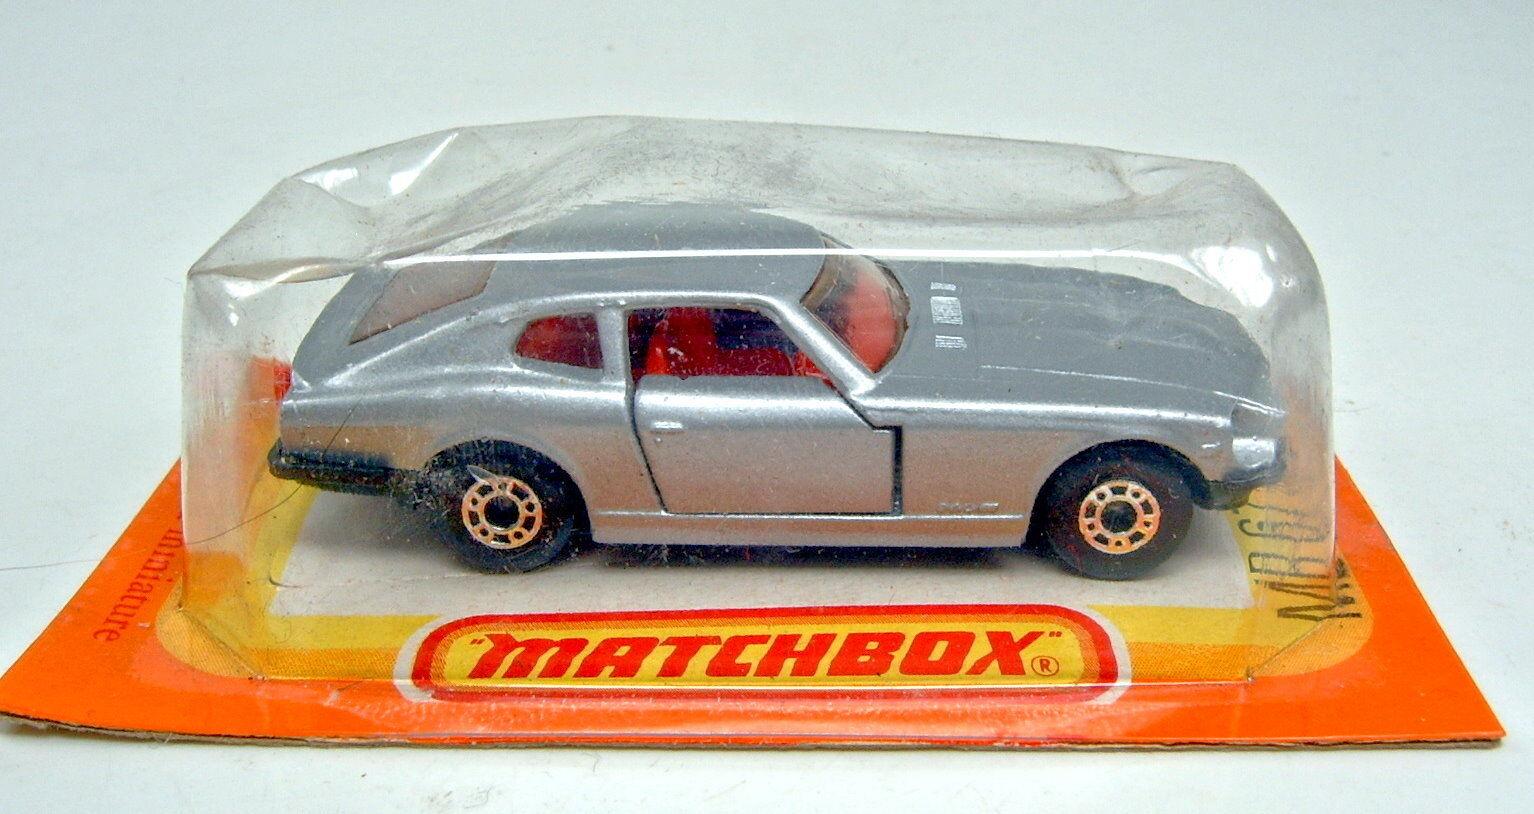 edición limitada en caliente Matchbox SF nº nº nº 67c Datsun 260z gris plata puertas abiertas en francés Box  mejor reputación